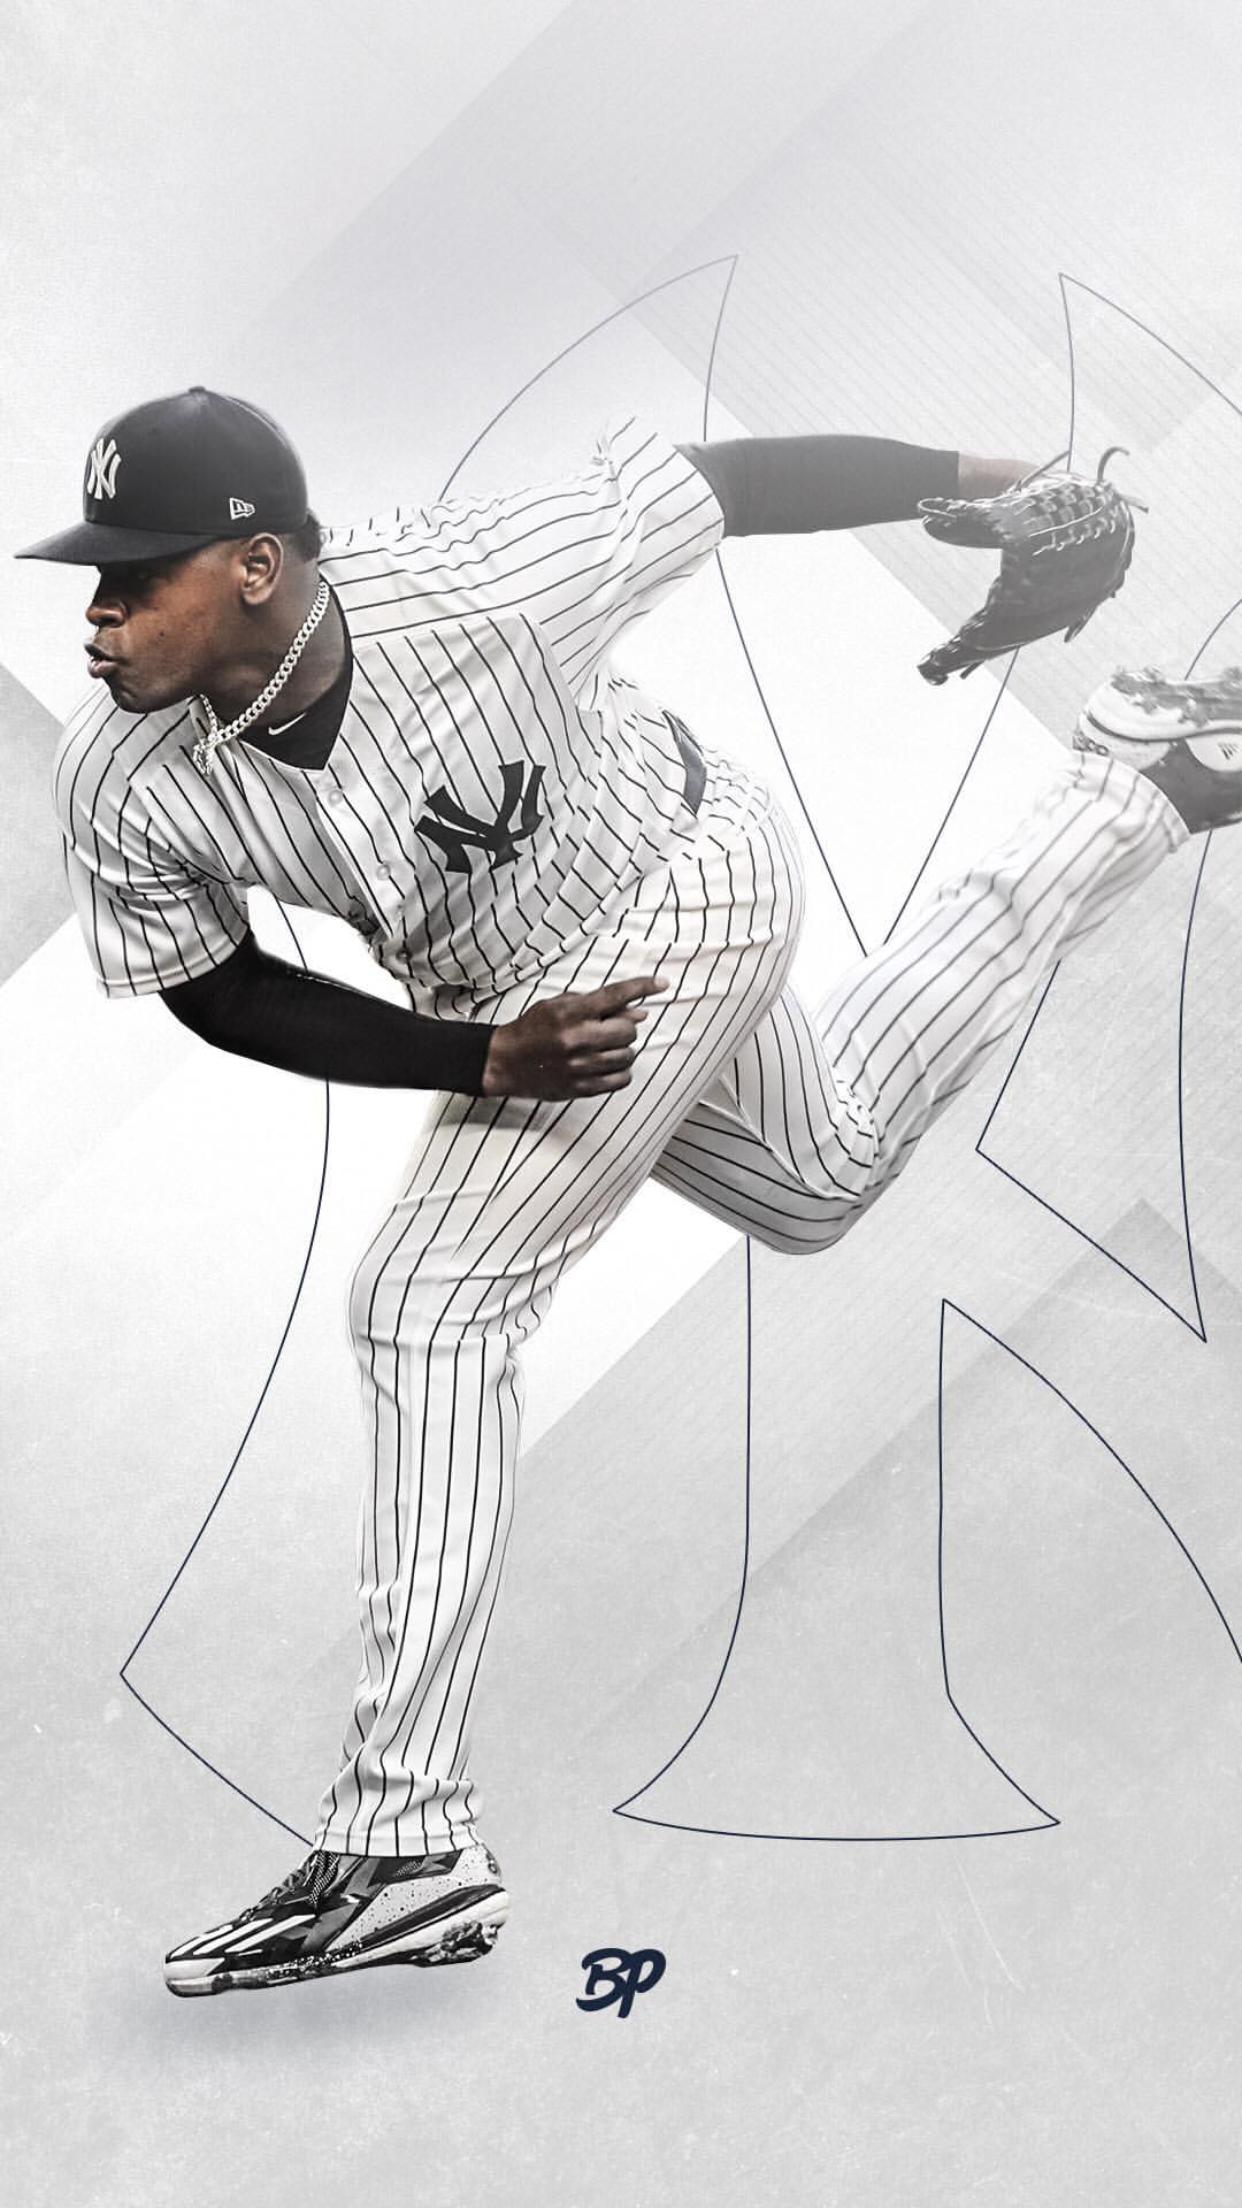 Luis Severino New York Yankees Baseball Ny Yankees Poster Go Yankees